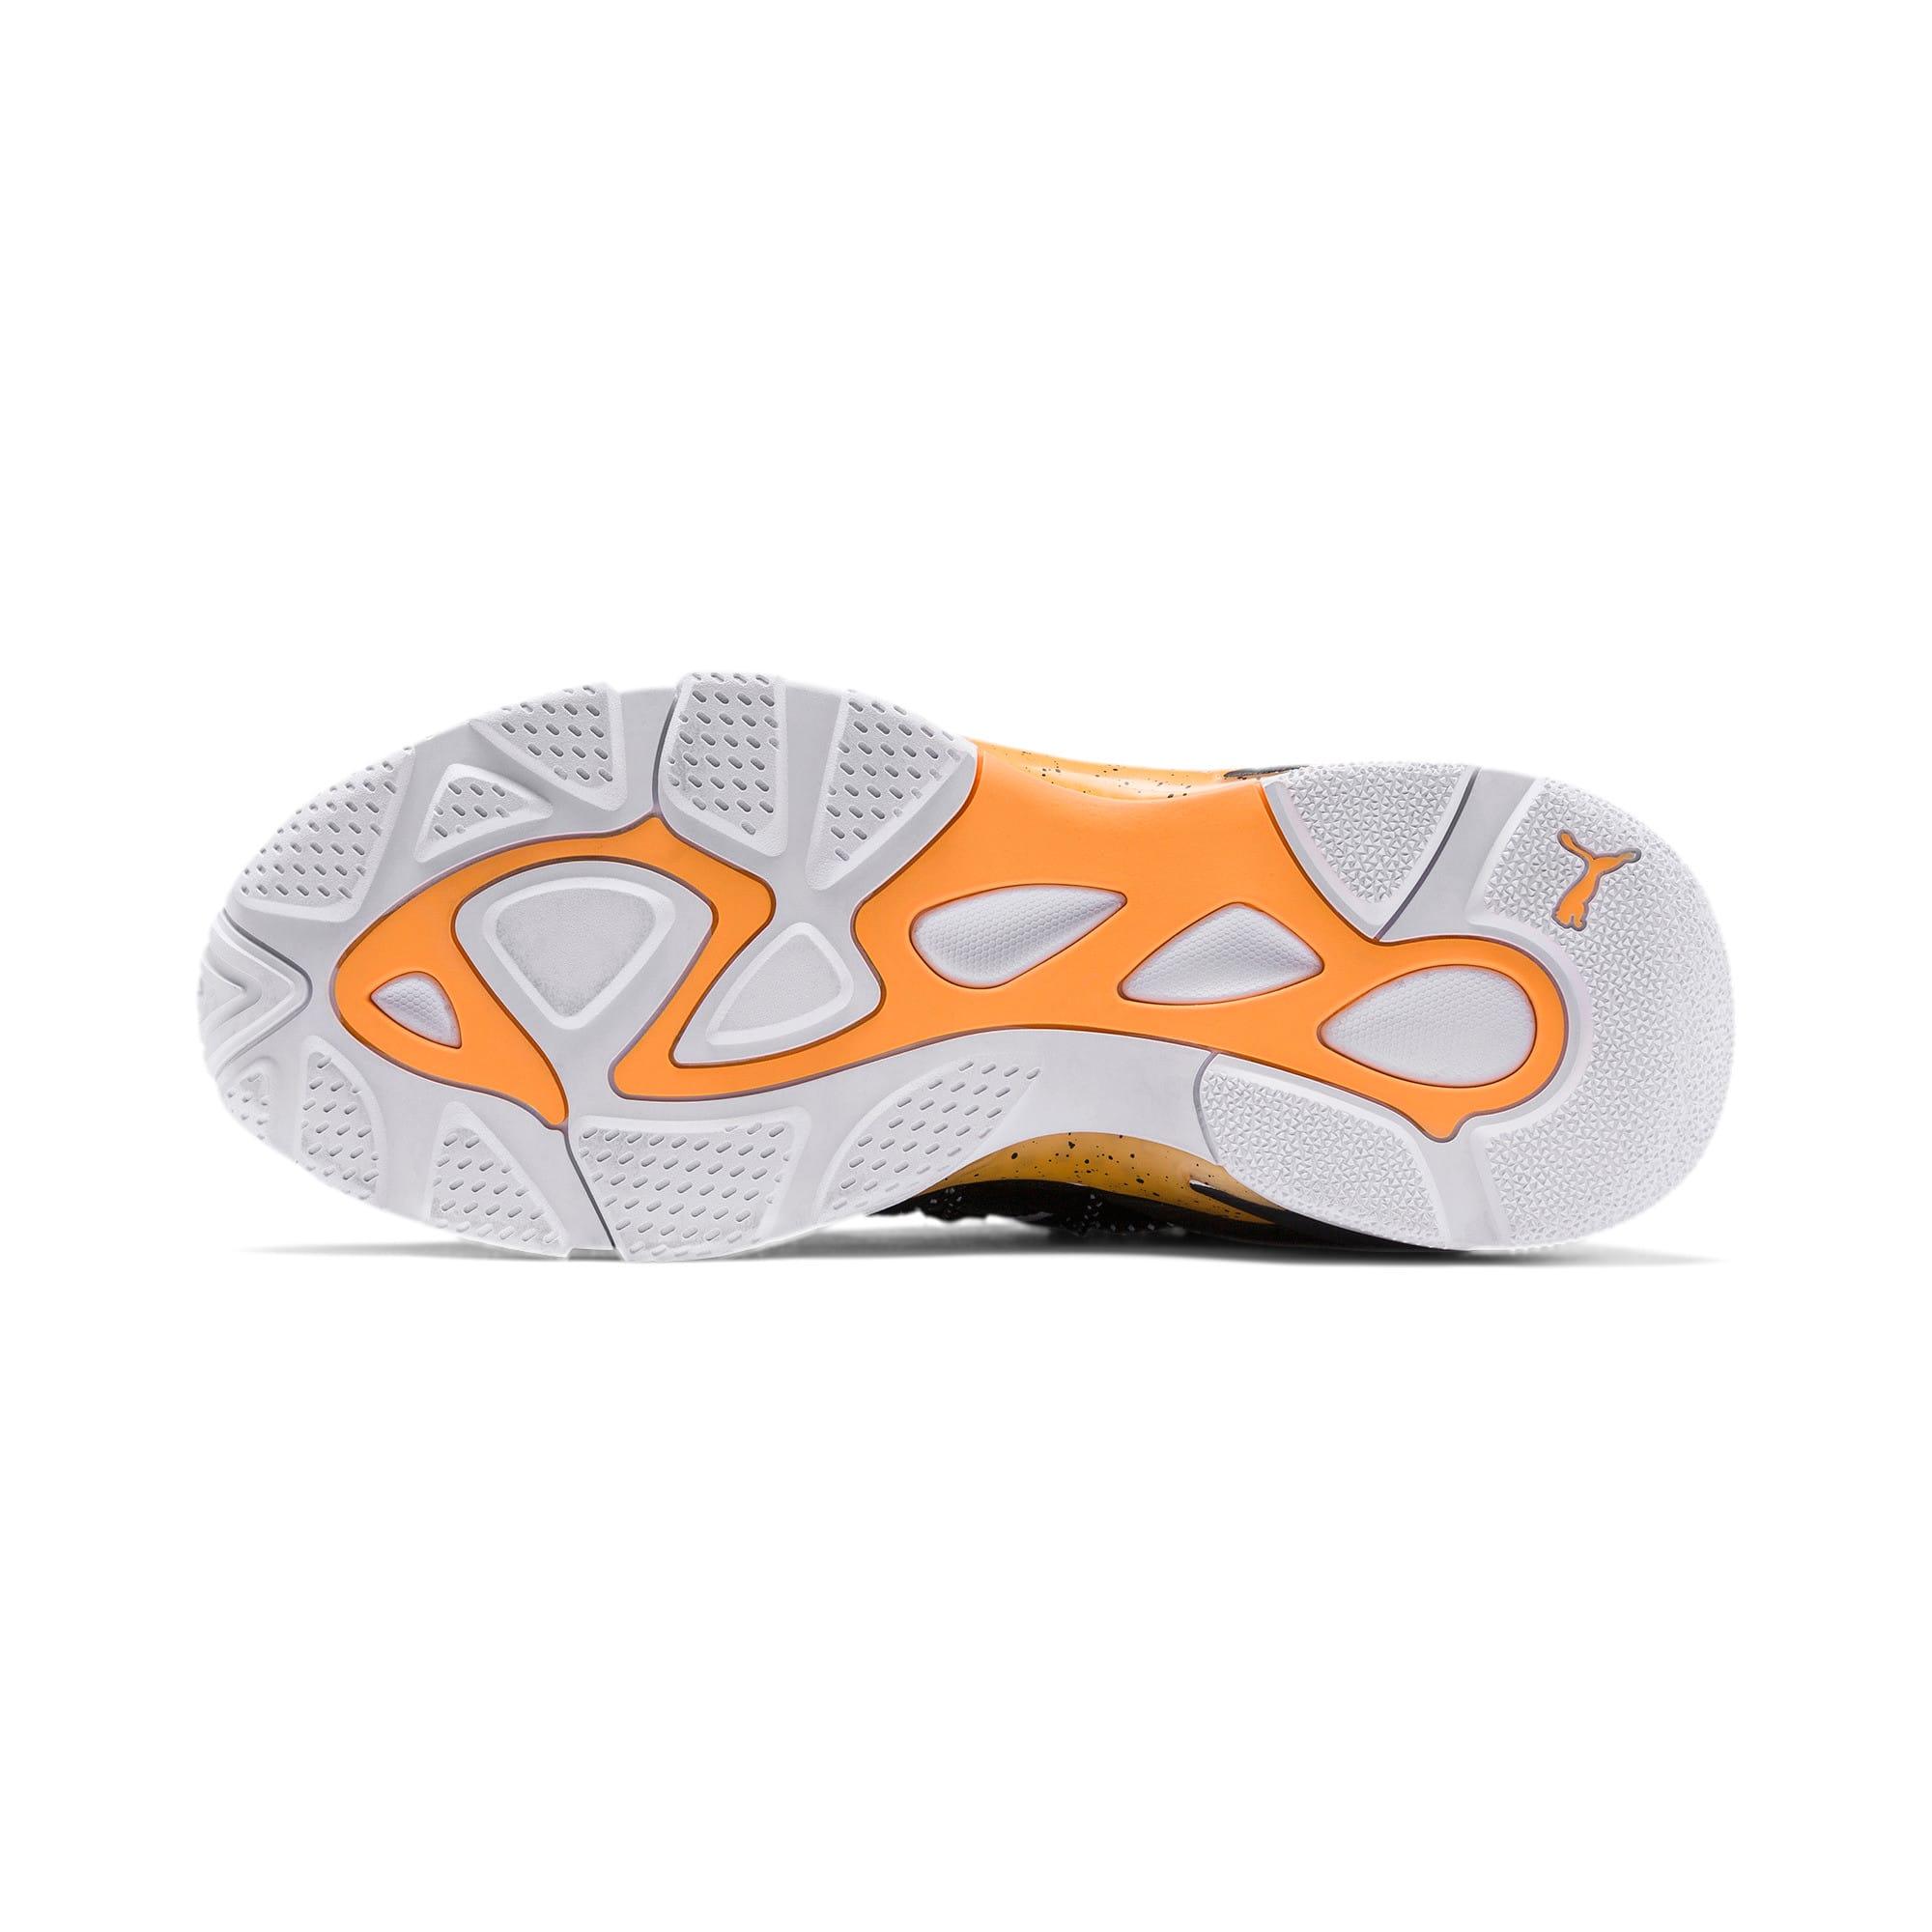 Thumbnail 4 of LQDCELL Omega Density Training Shoes, Puma White-Puma Black, medium